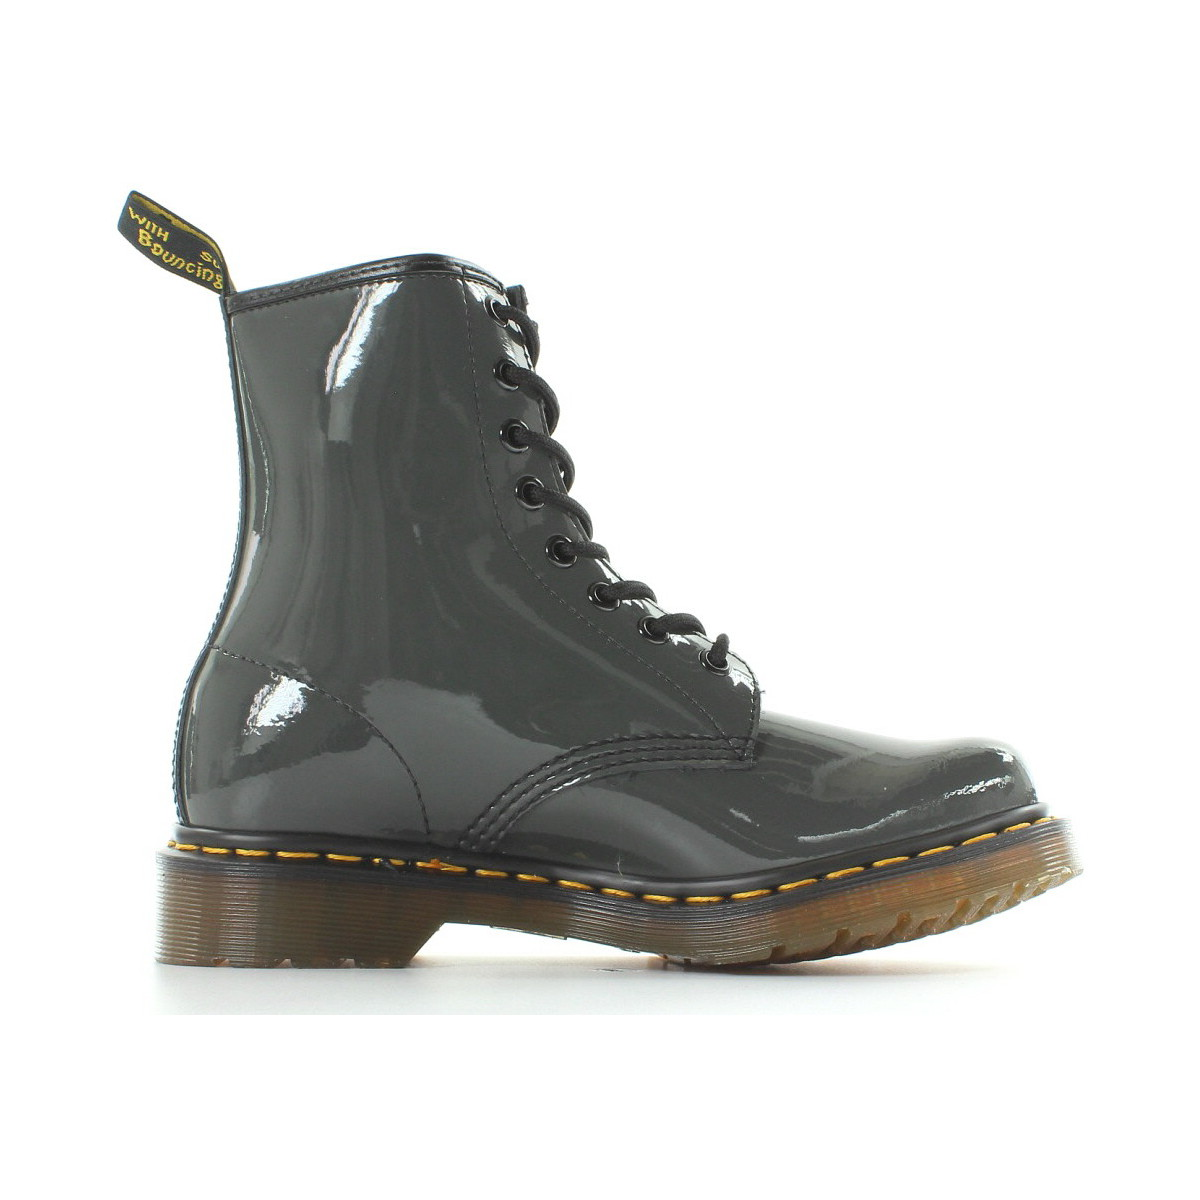 203750a7192 Dr Martens 1460 Vernis Gris Dr Martens   Janel chaussures